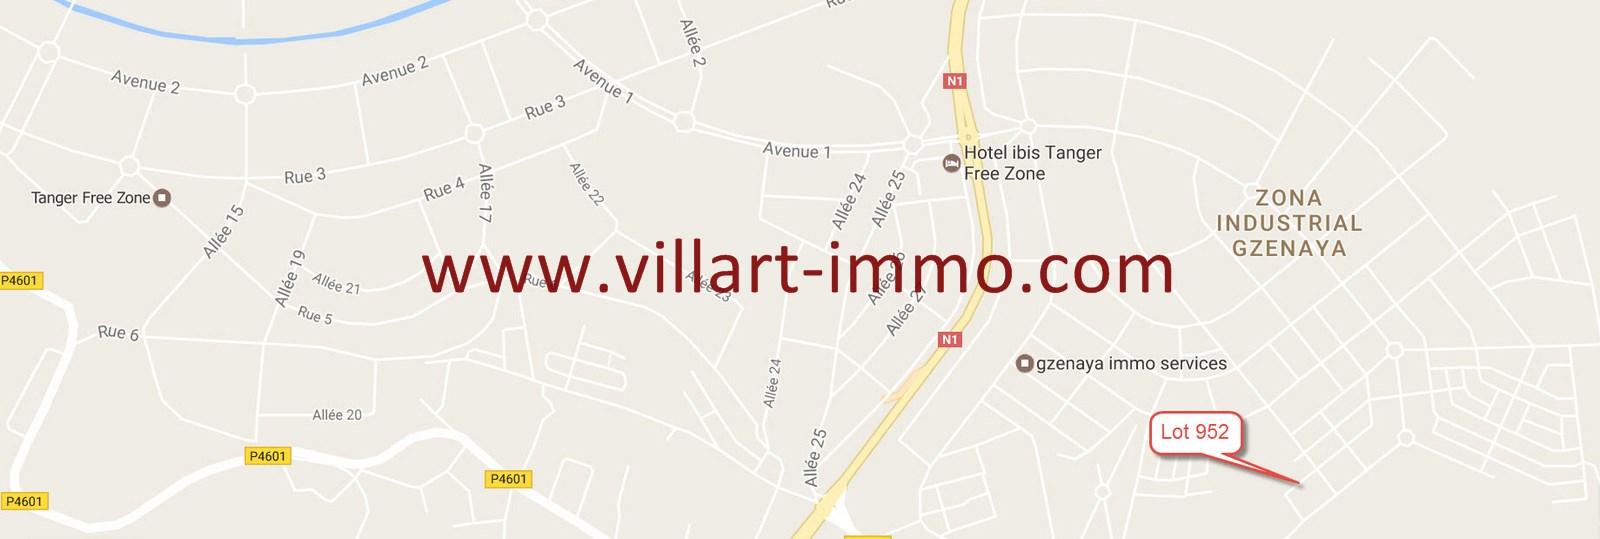 4-Vente-Terrain-Tanger-Gzenaya-VT28-Villart Immo (Copier)